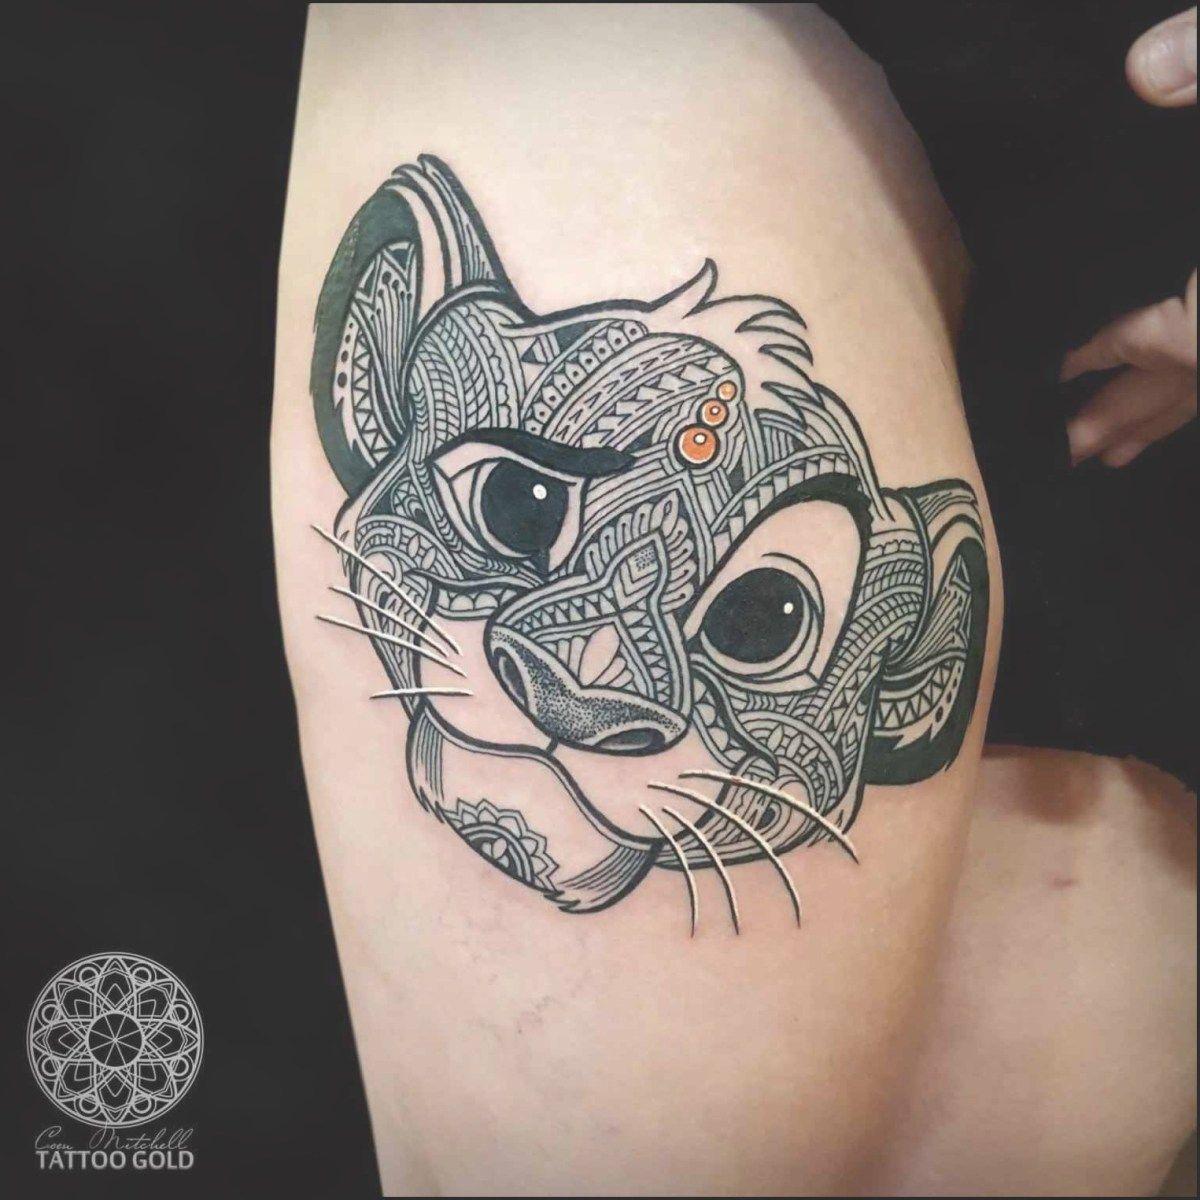 Black king tattoo ideas hip tattoos rose tattoo thigh danielhuscroftcom womenus badass